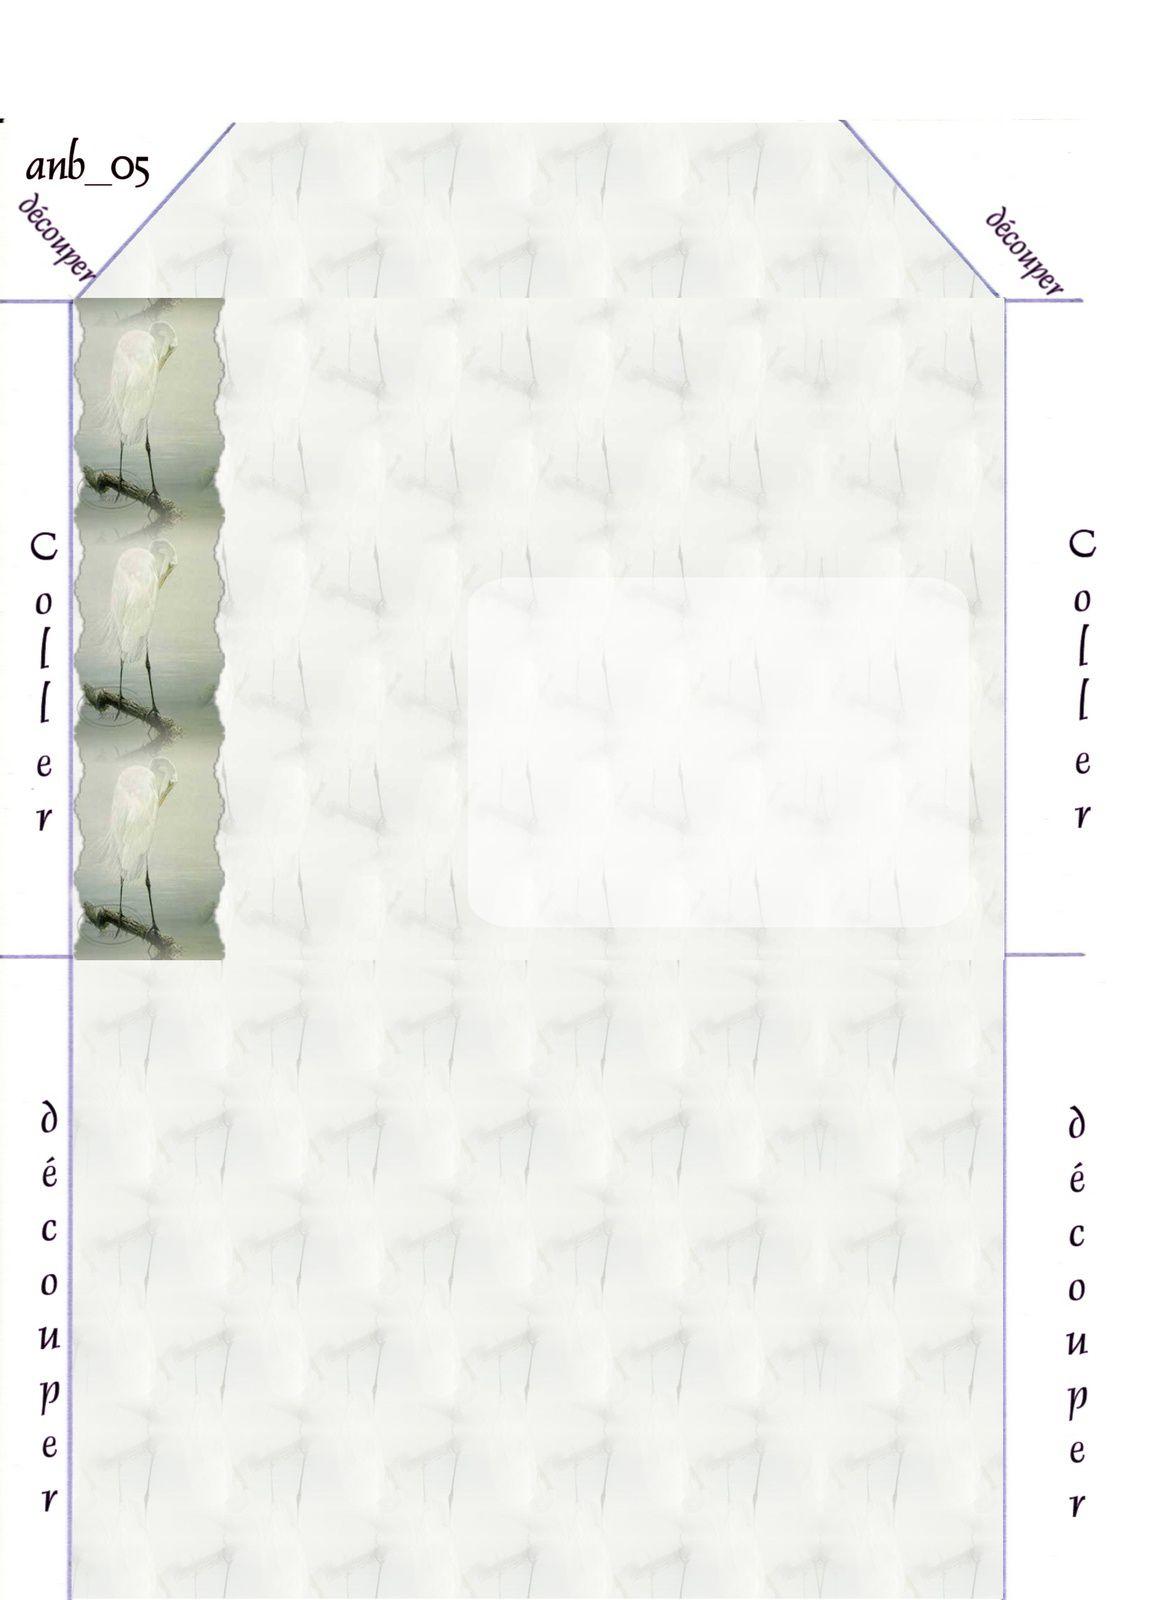 Oiseau Incredimail &amp&#x3B; Papier A4 h l &amp&#x3B; outlook &amp&#x3B; enveloppe &amp&#x3B; 2 cartes A5 &amp&#x3B; signets 3 langues   ois_hugo_pl7o034w_00